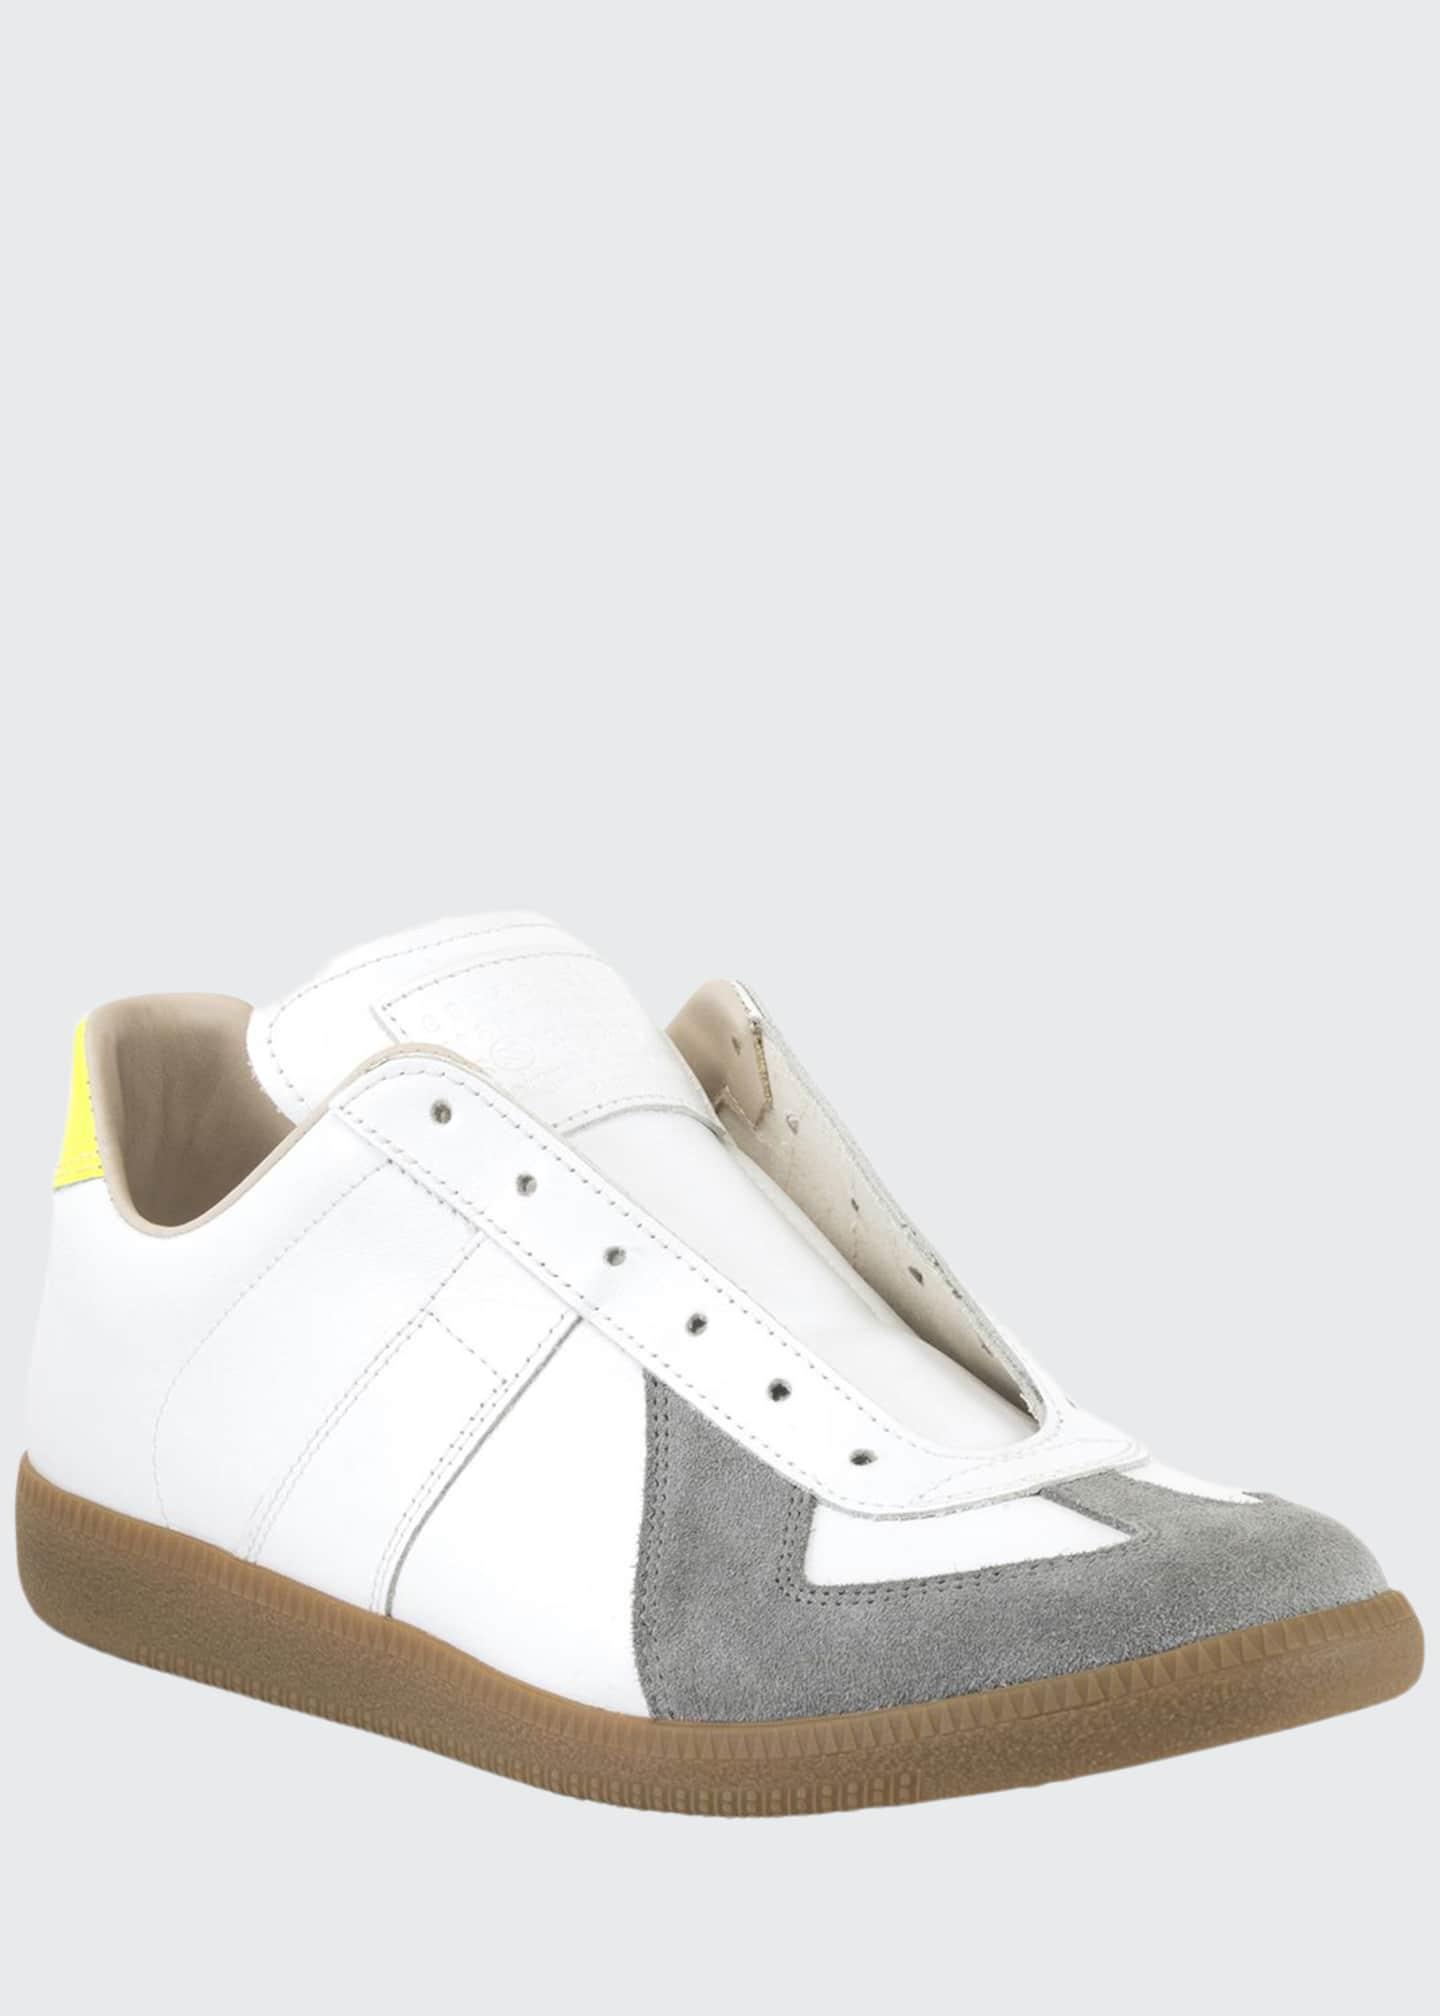 Maison Margiela Men's Replica Colorblock Leather/Suede Low-Top